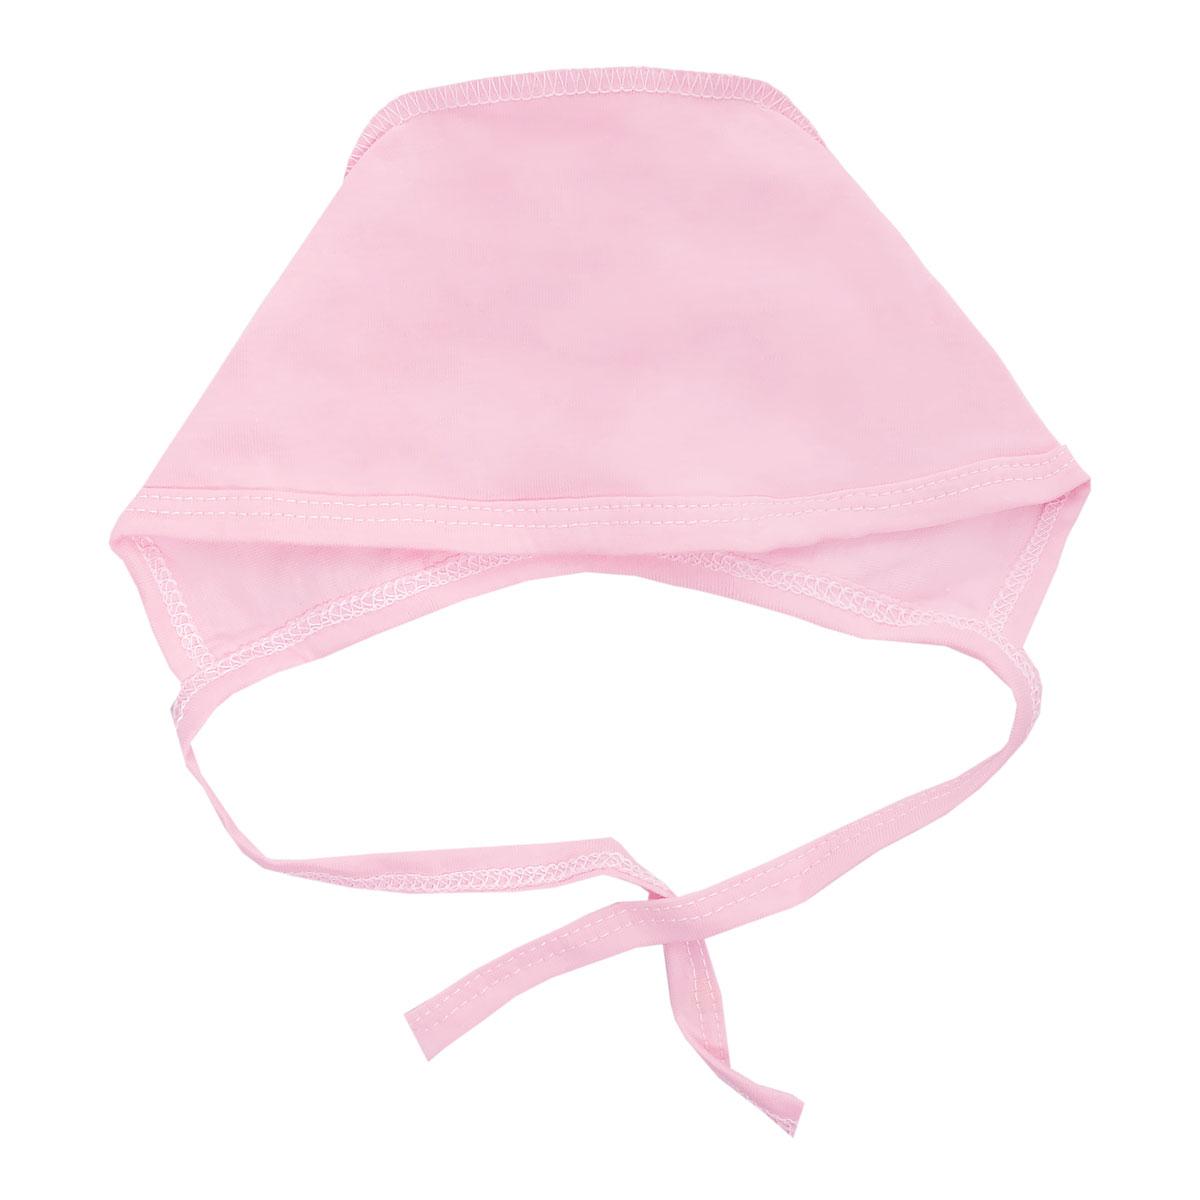 Чепчик унисекс Трон-Плюс, цвет: розовый. 6105. Размер 80, 12 месяцев